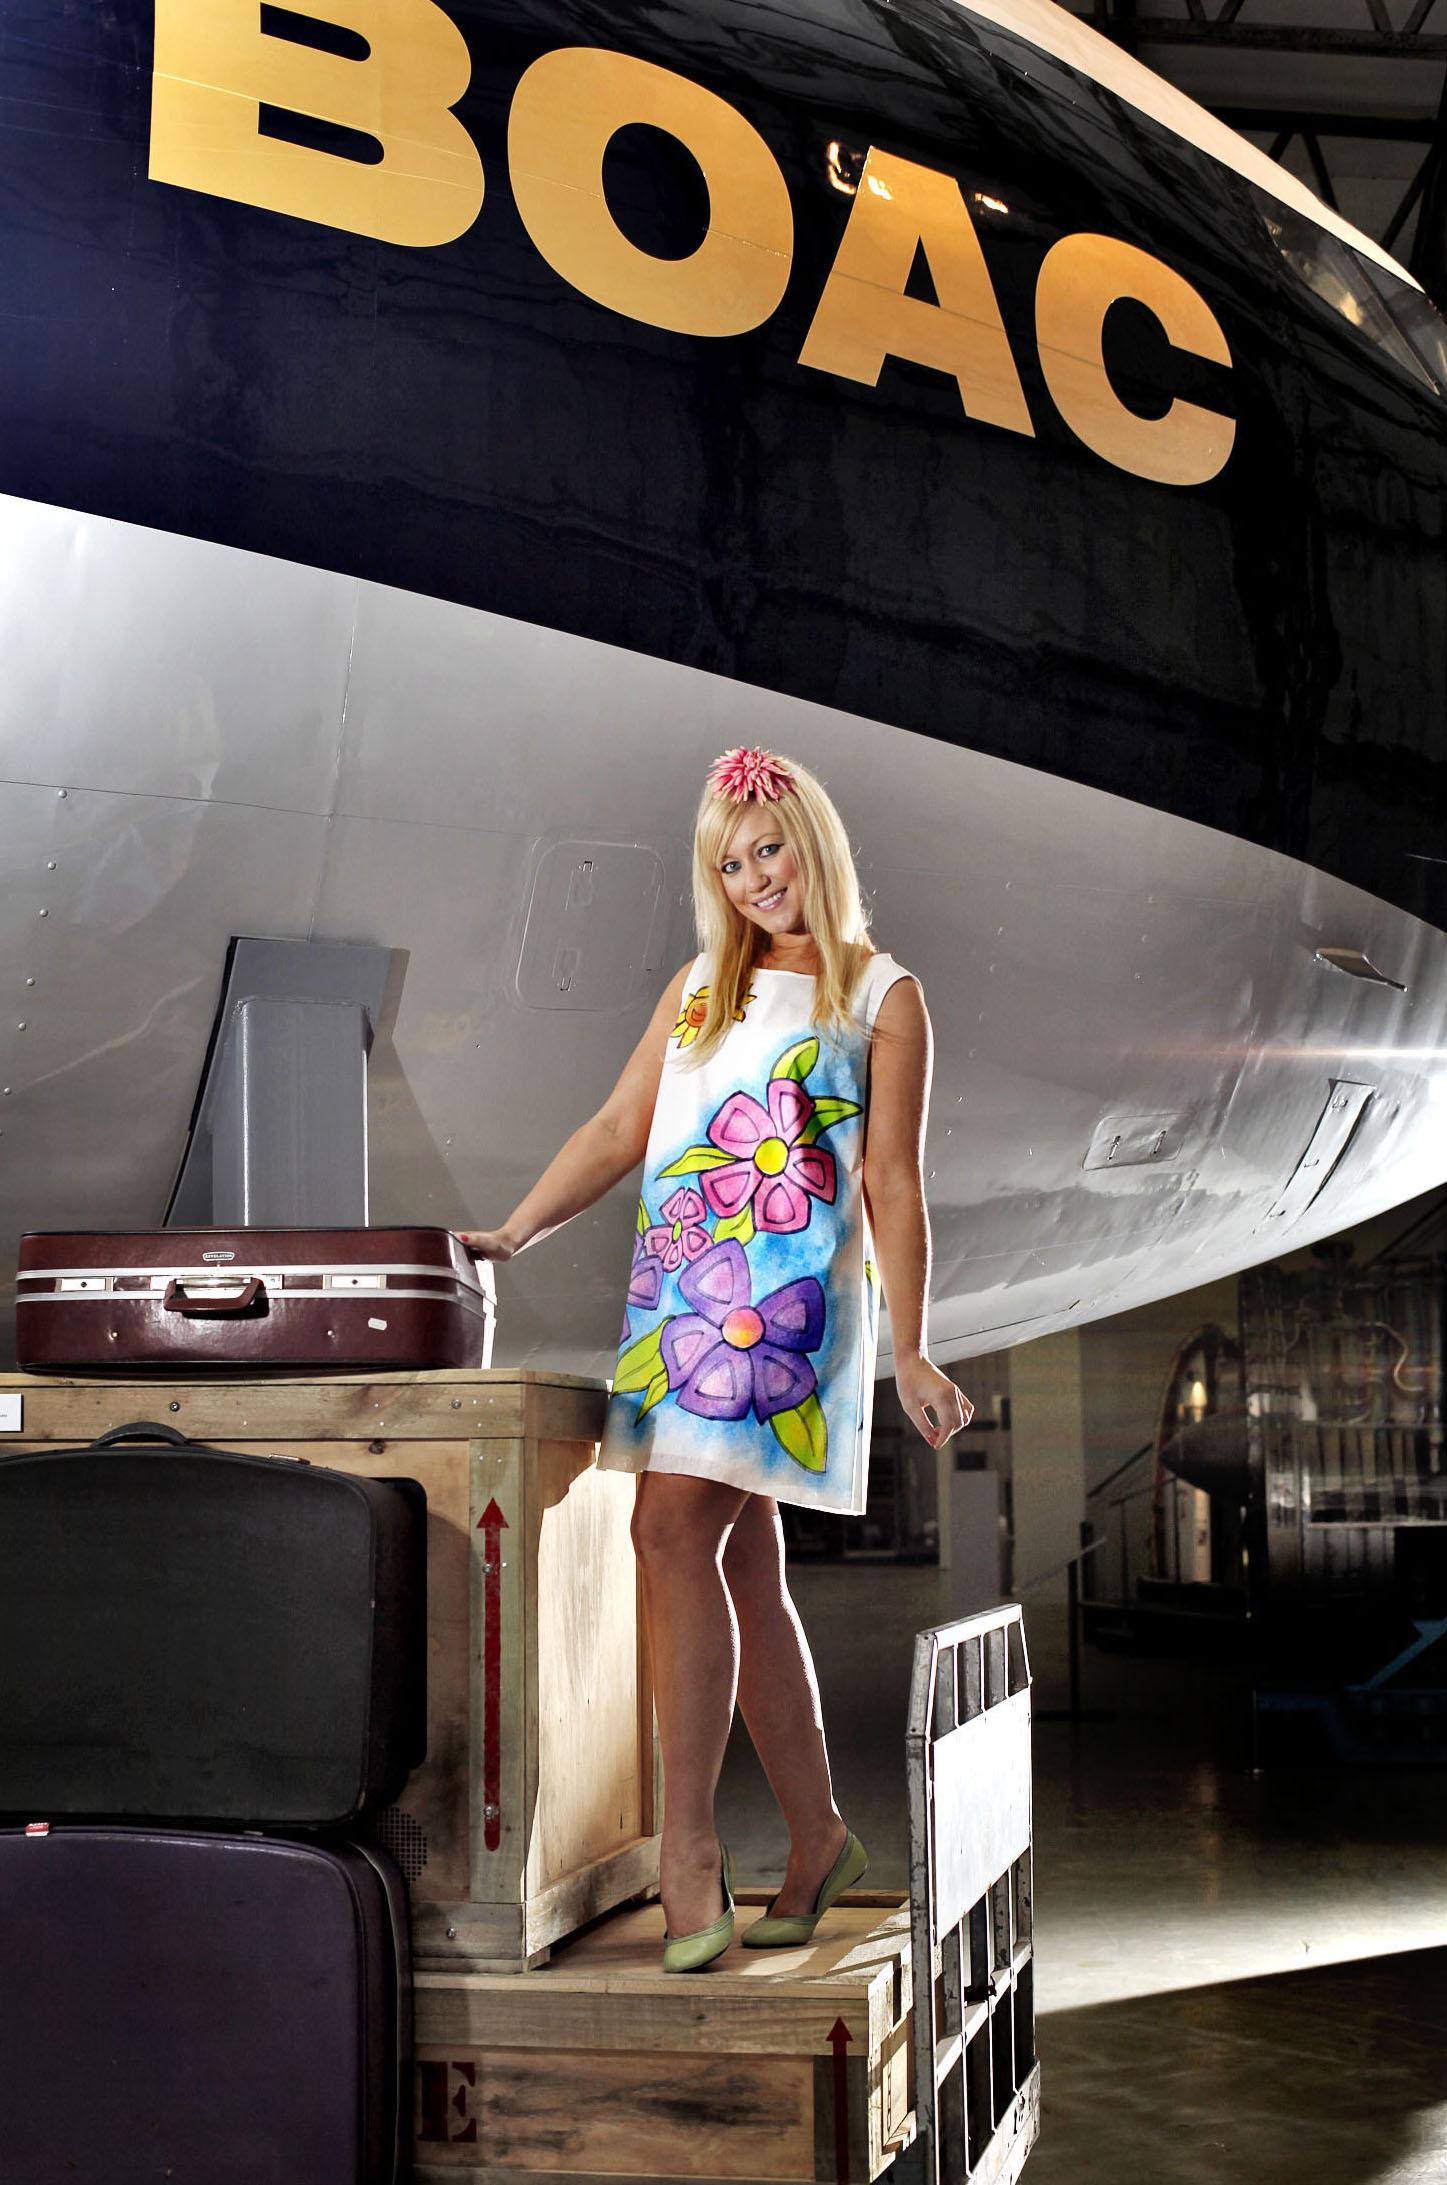 Boeing 707 air hostess © Paul Dodds